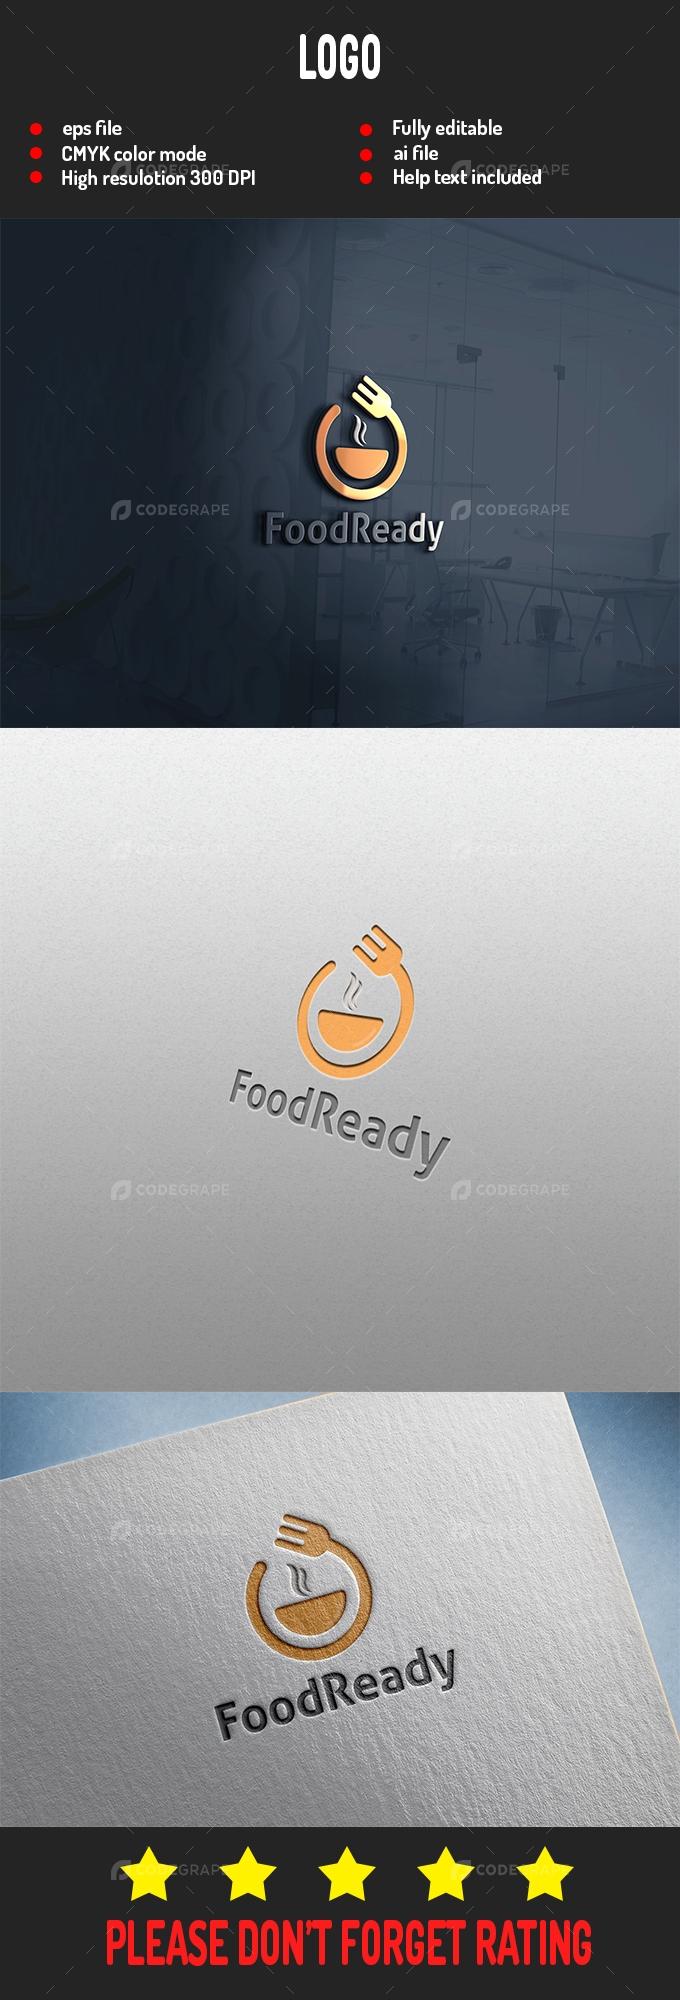 Food Ready Logo